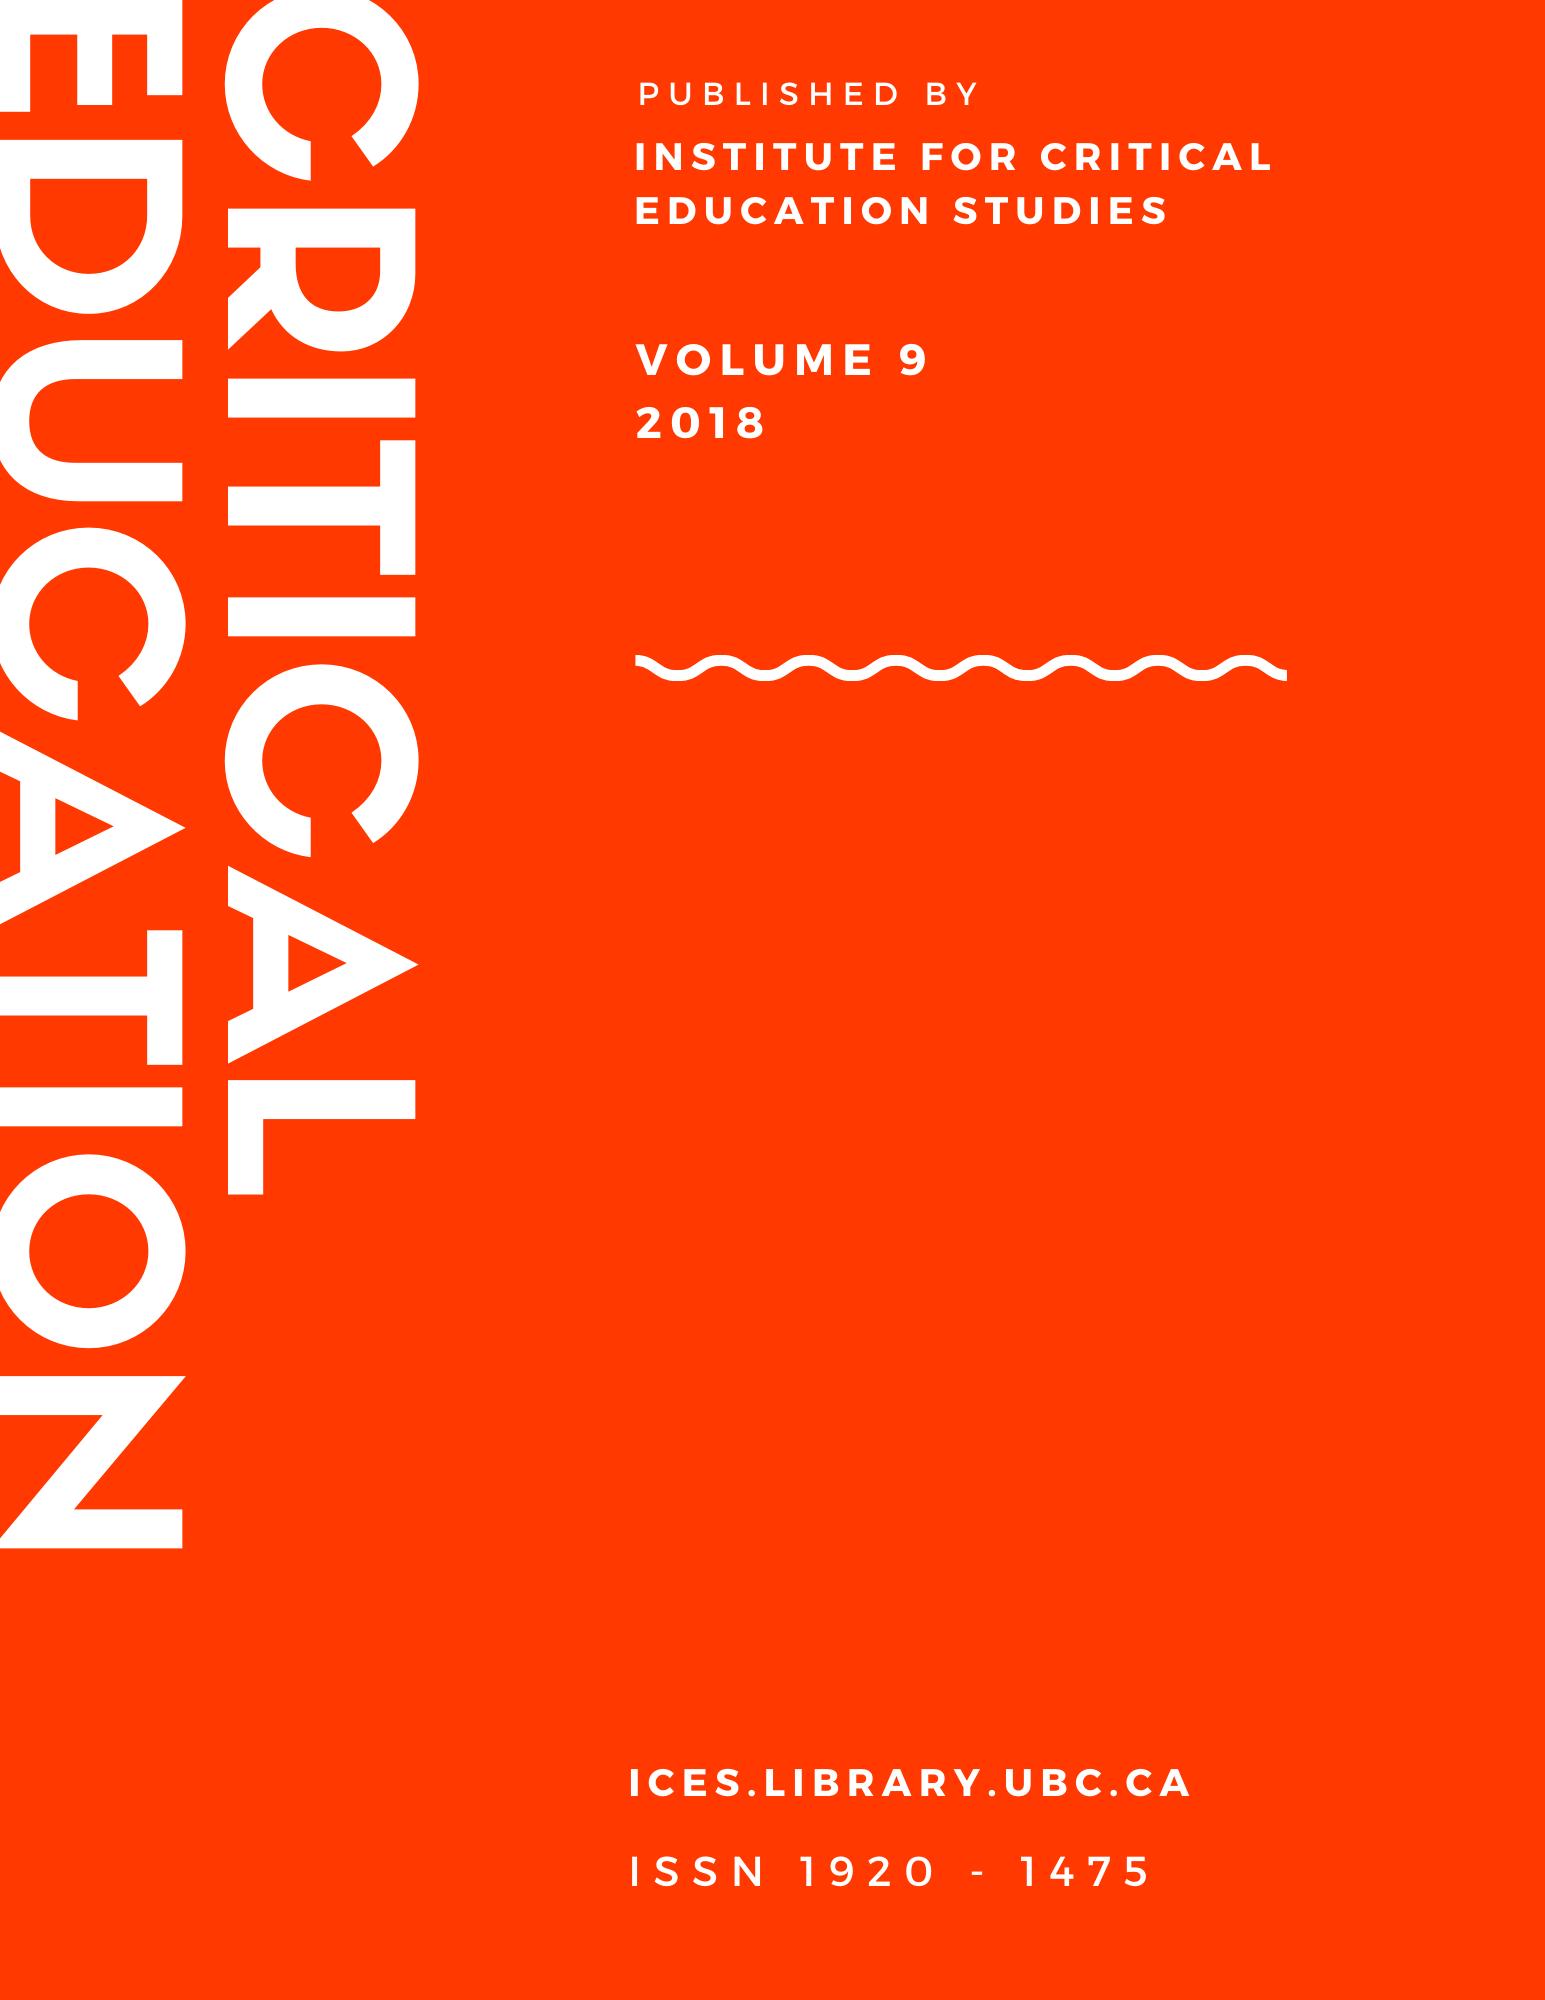 View Vol. 9 No. 15 (2018)